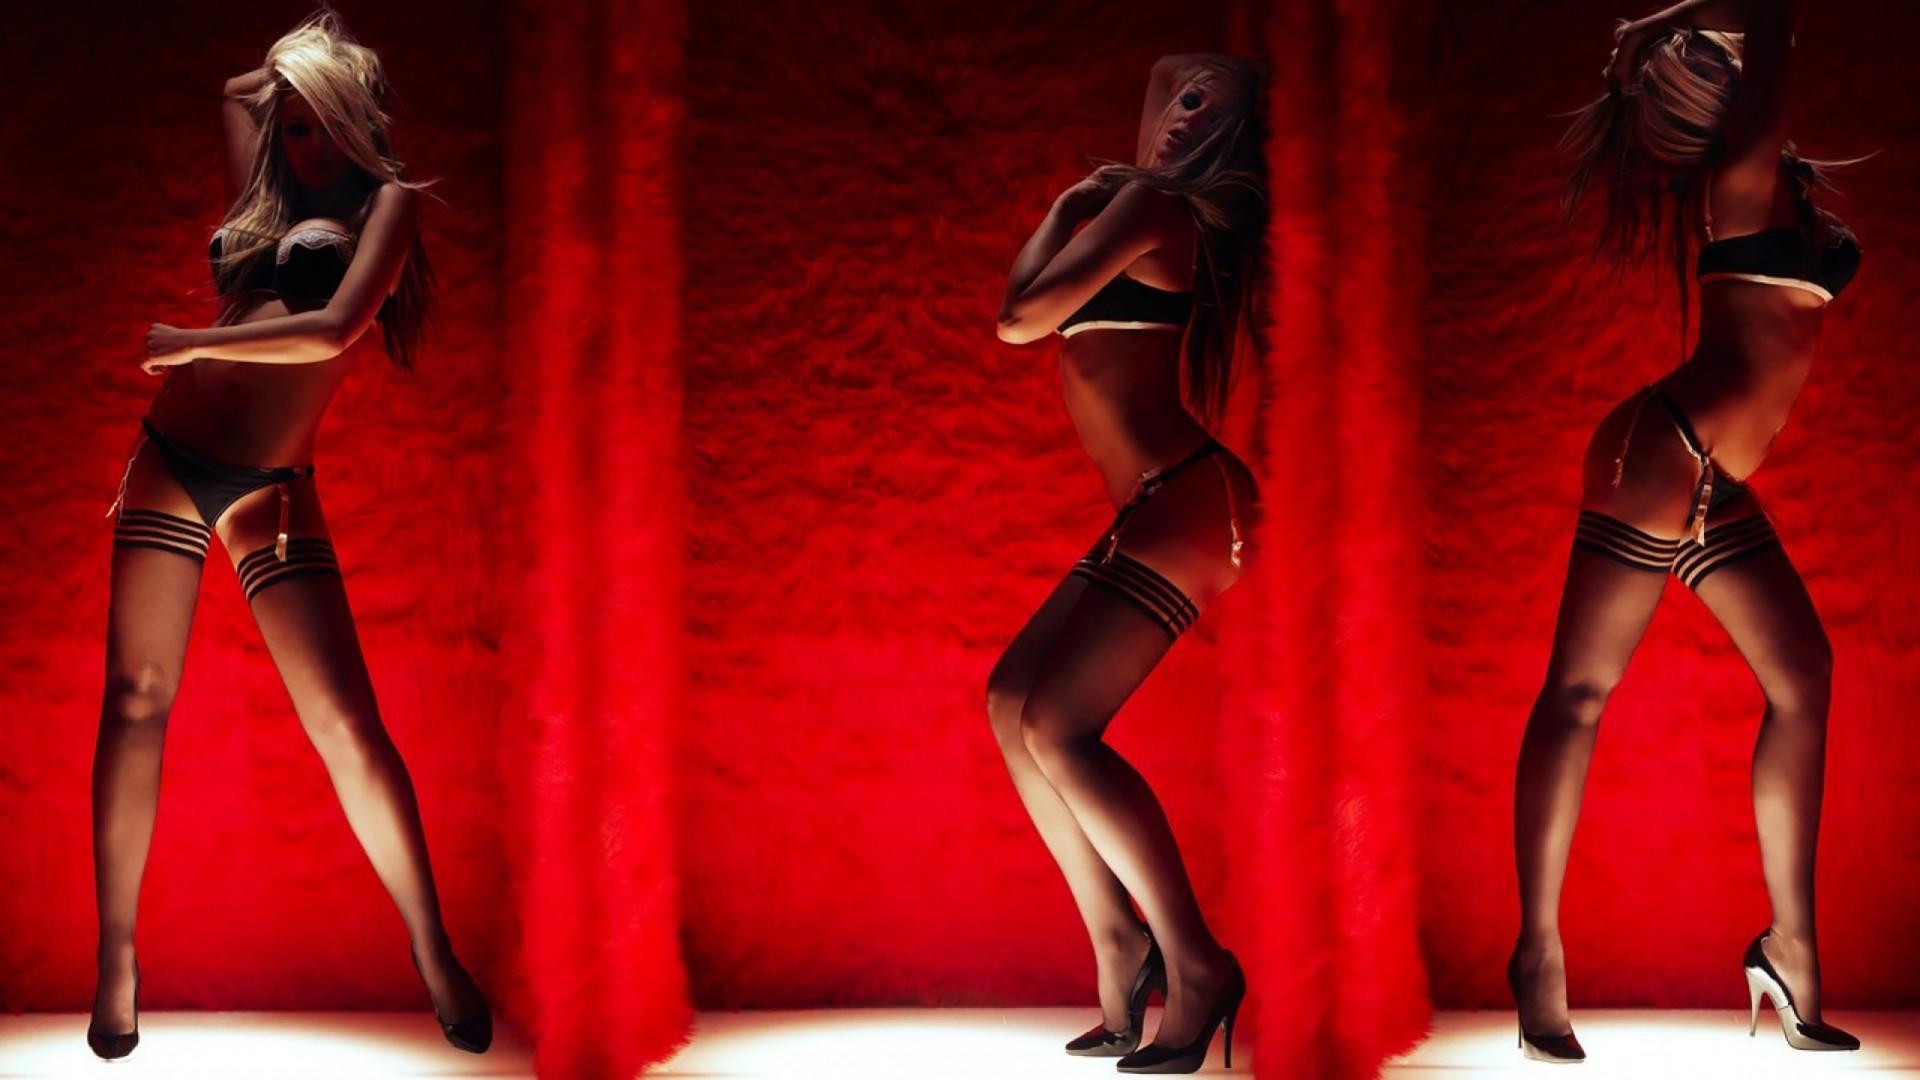 Naked women italian girls nude